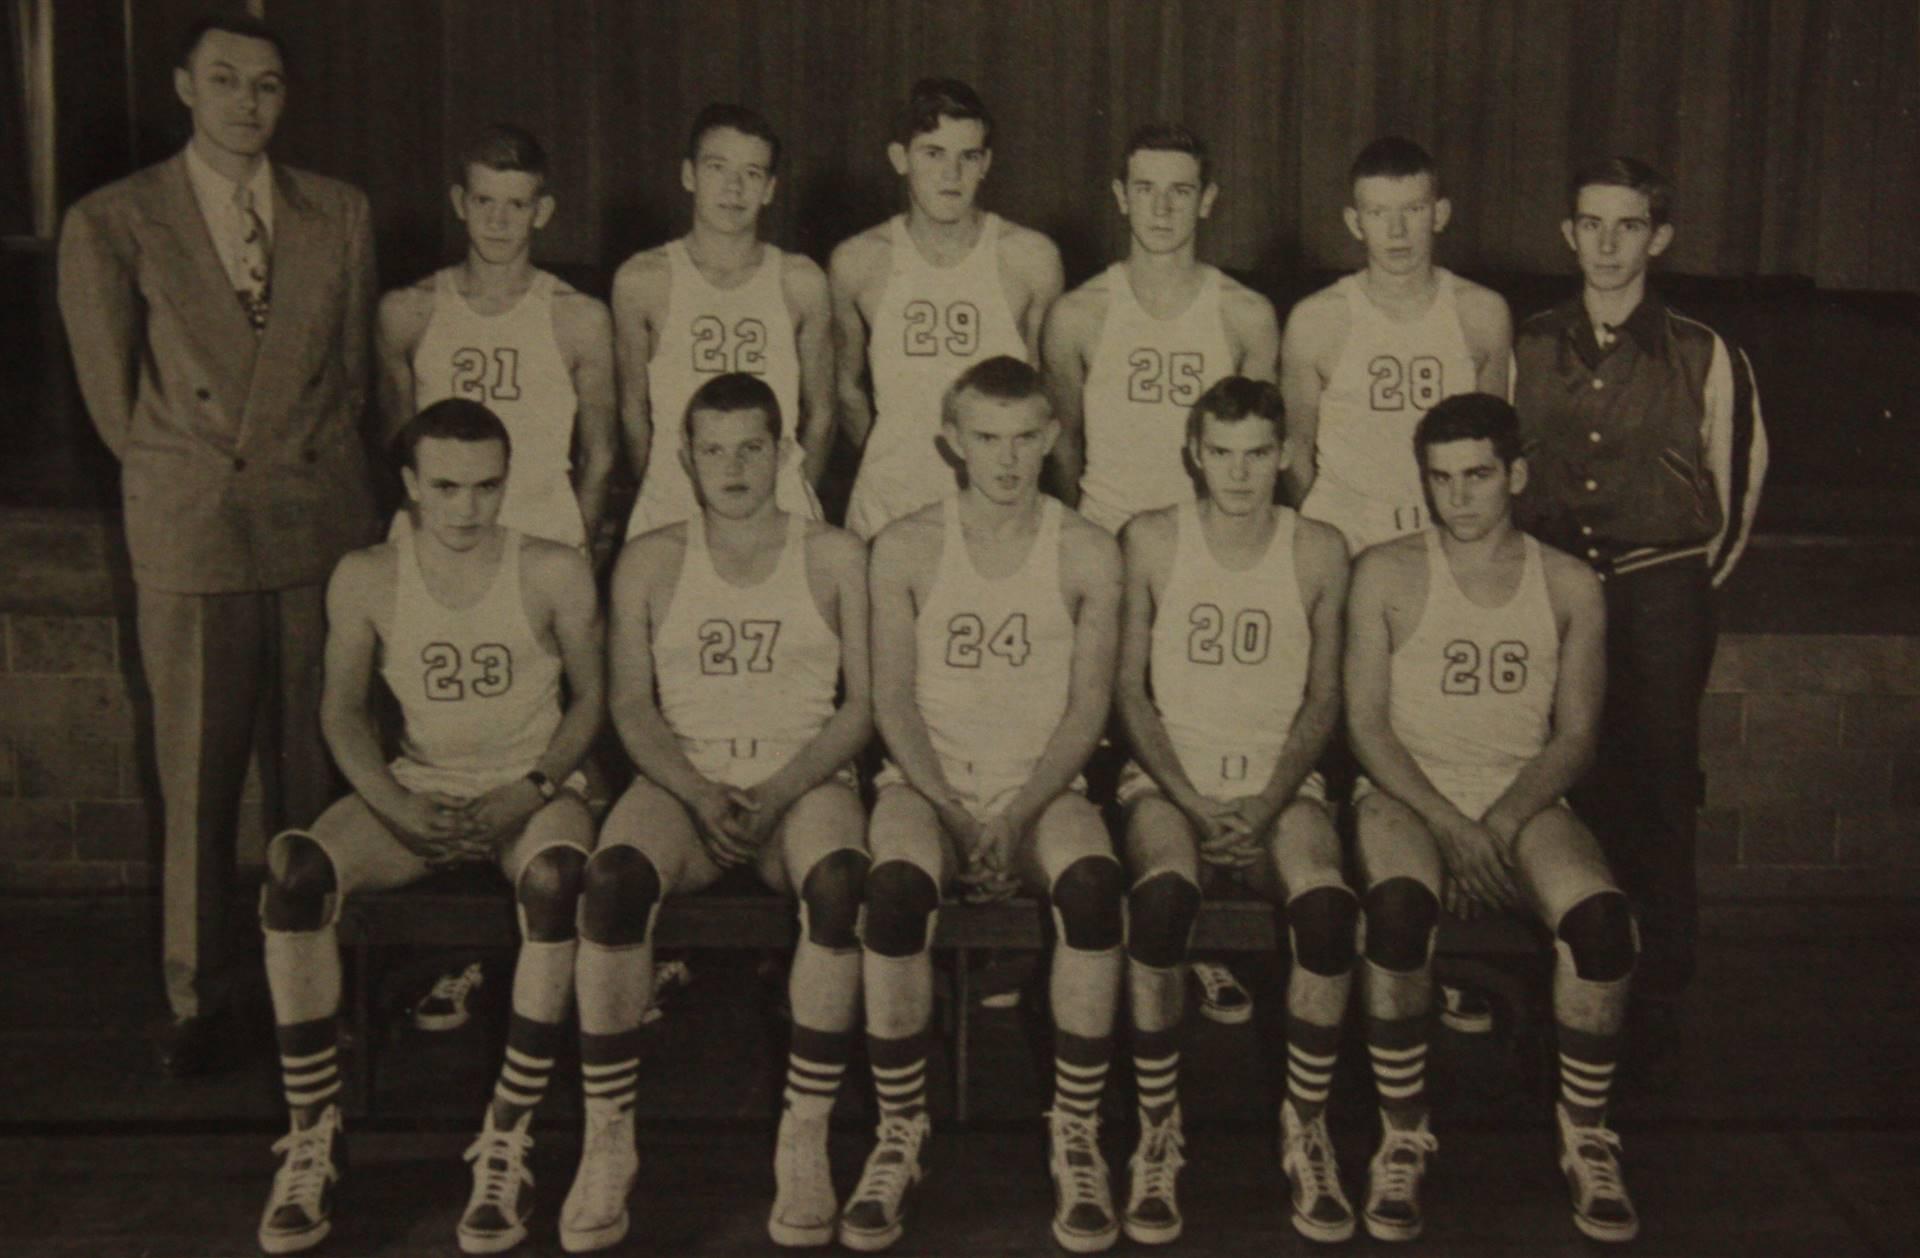 1952 Boy's Sports